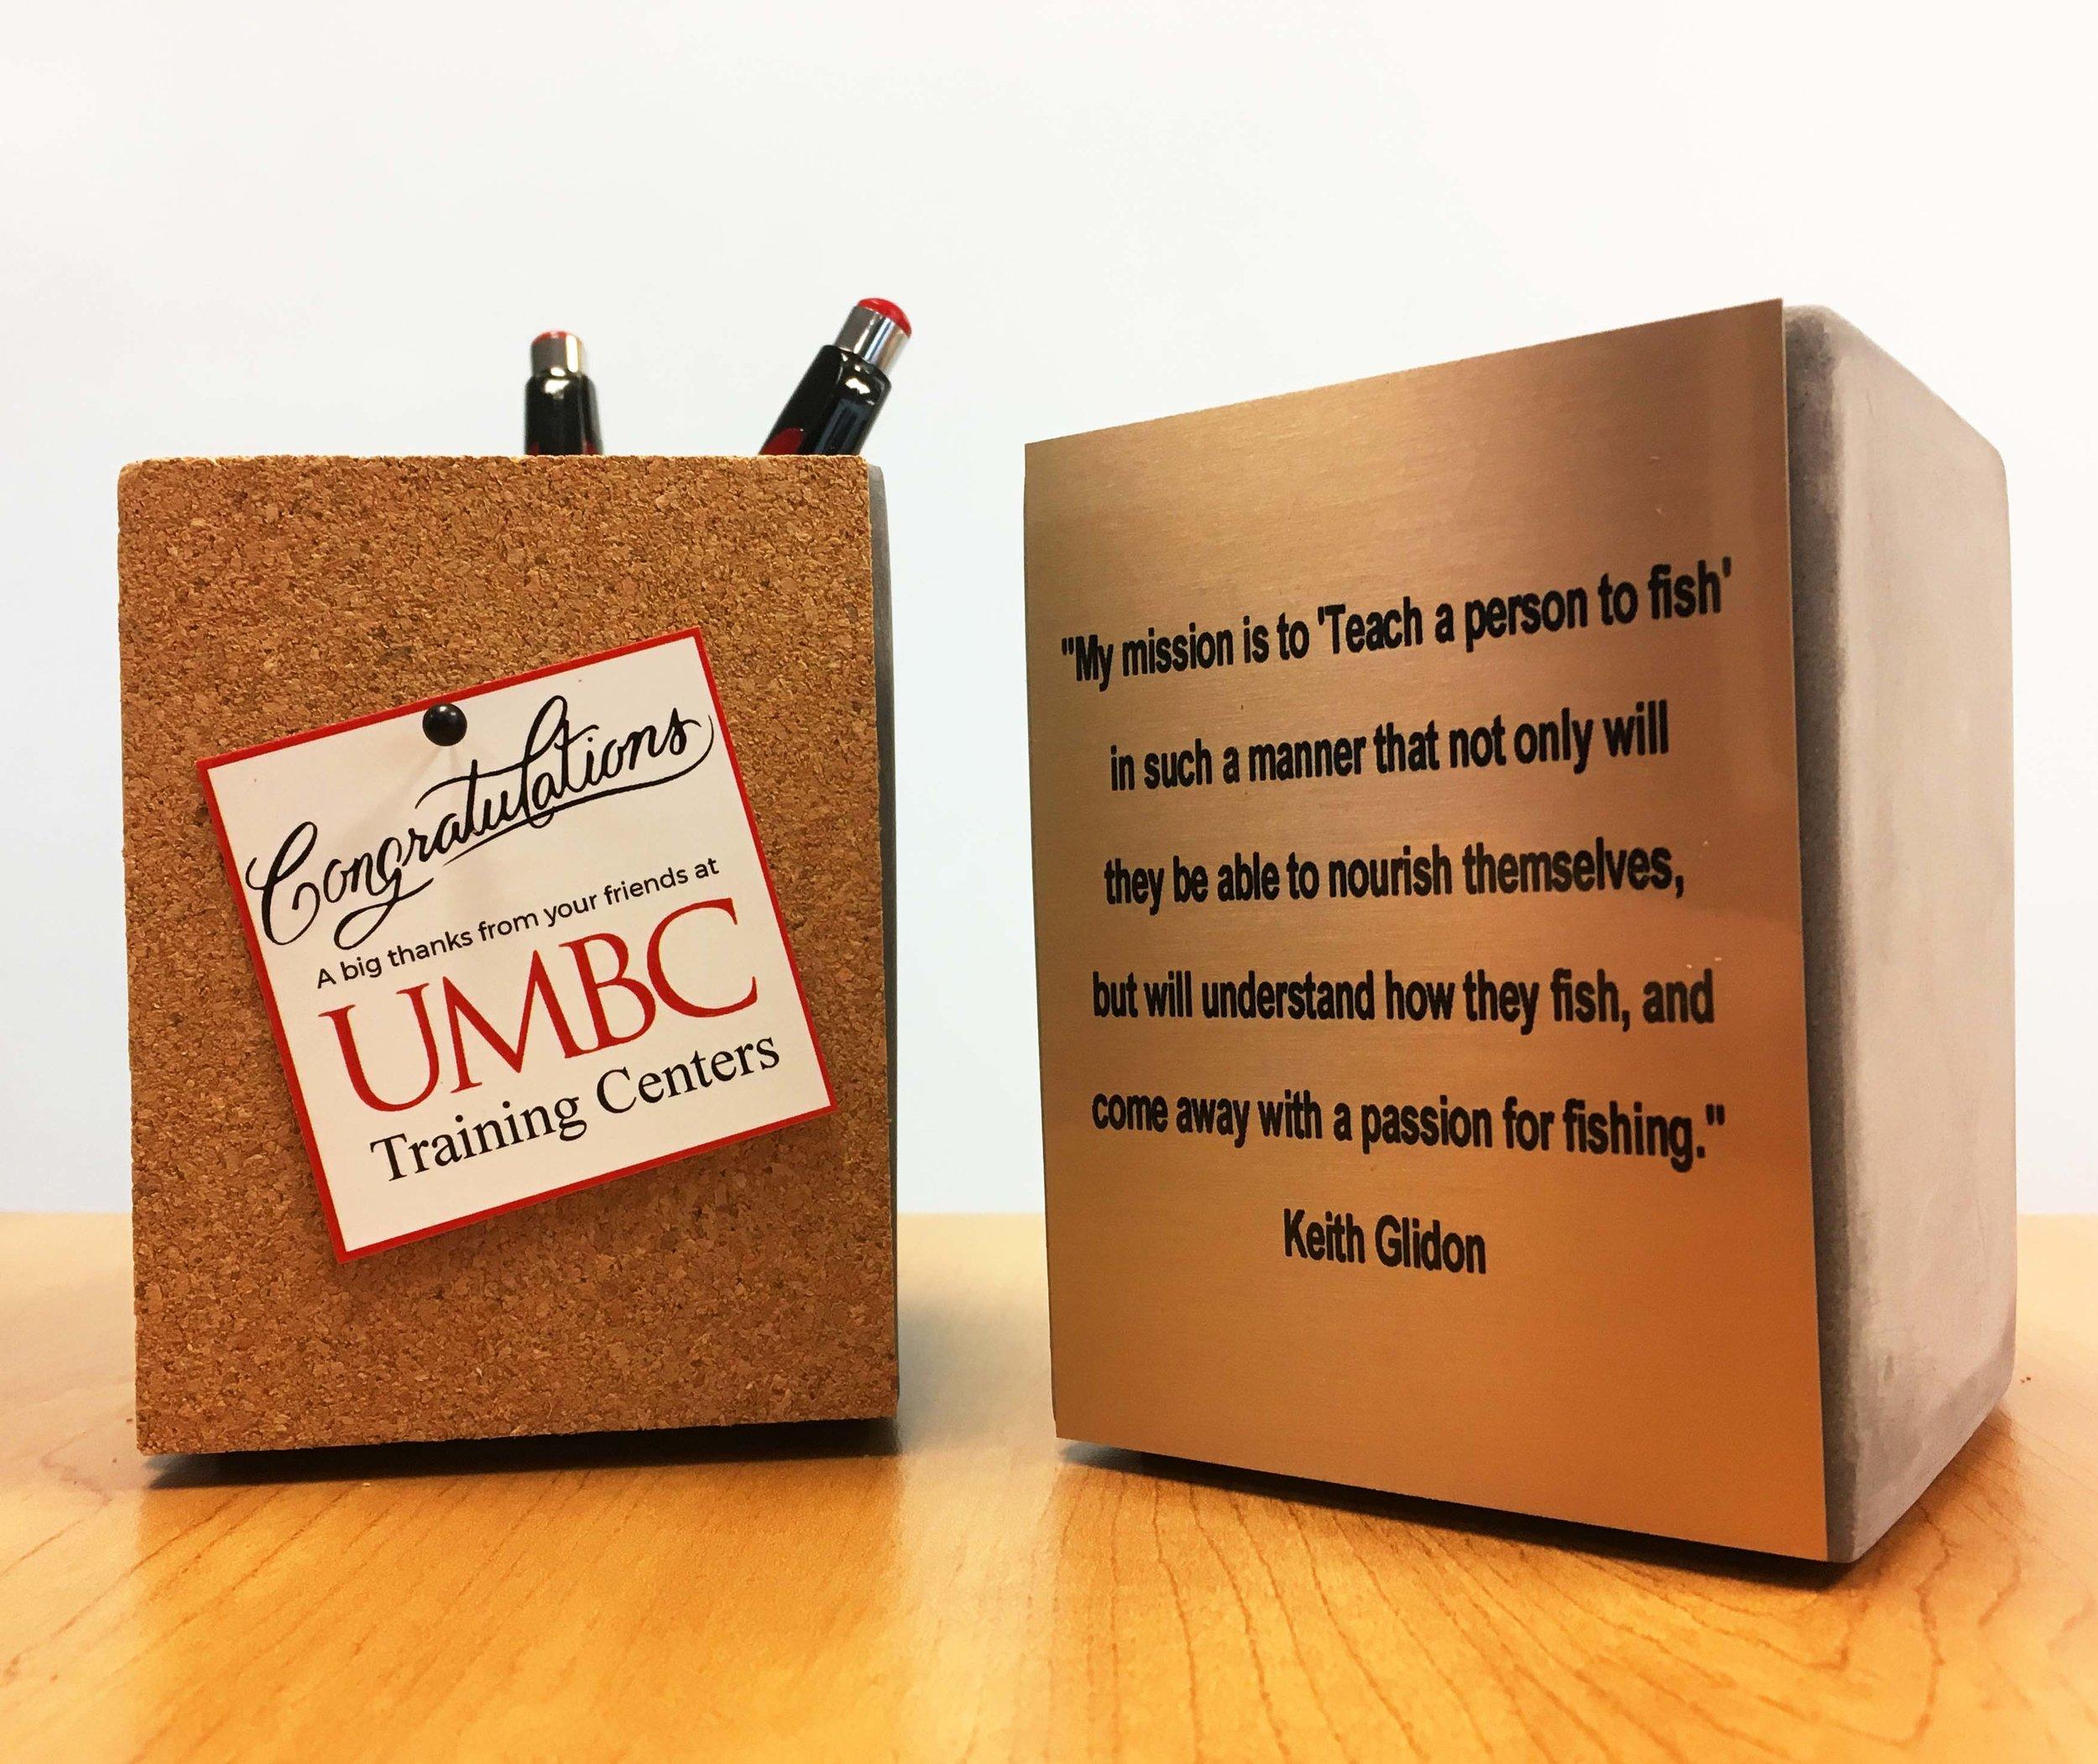 2017 UMBC Training Centers Completion Award Take-Away